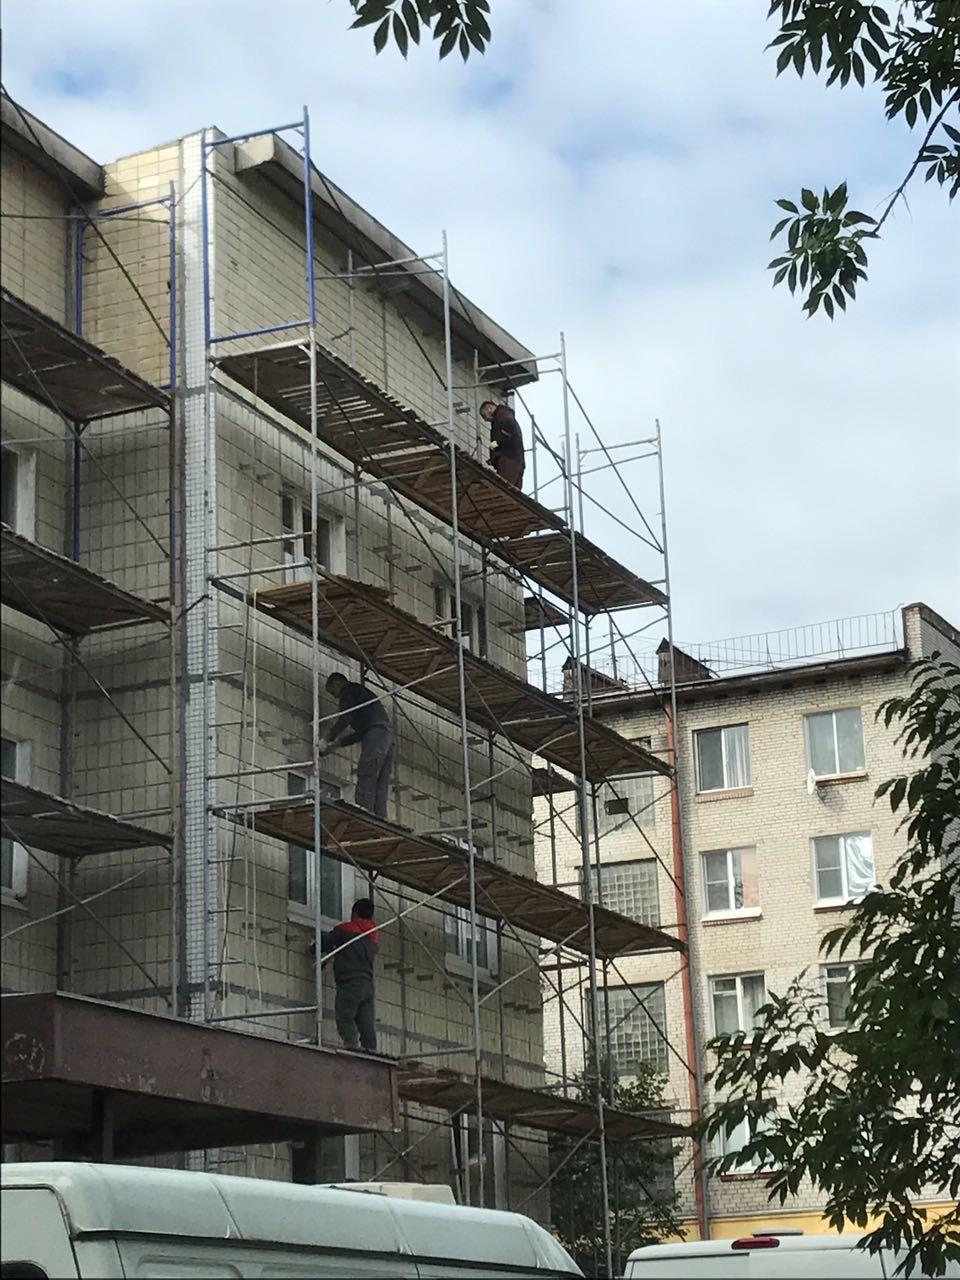 Устройство вентилируемого фасада здания Центра занятости вг. Гатчина для Администрации г. Гатчина